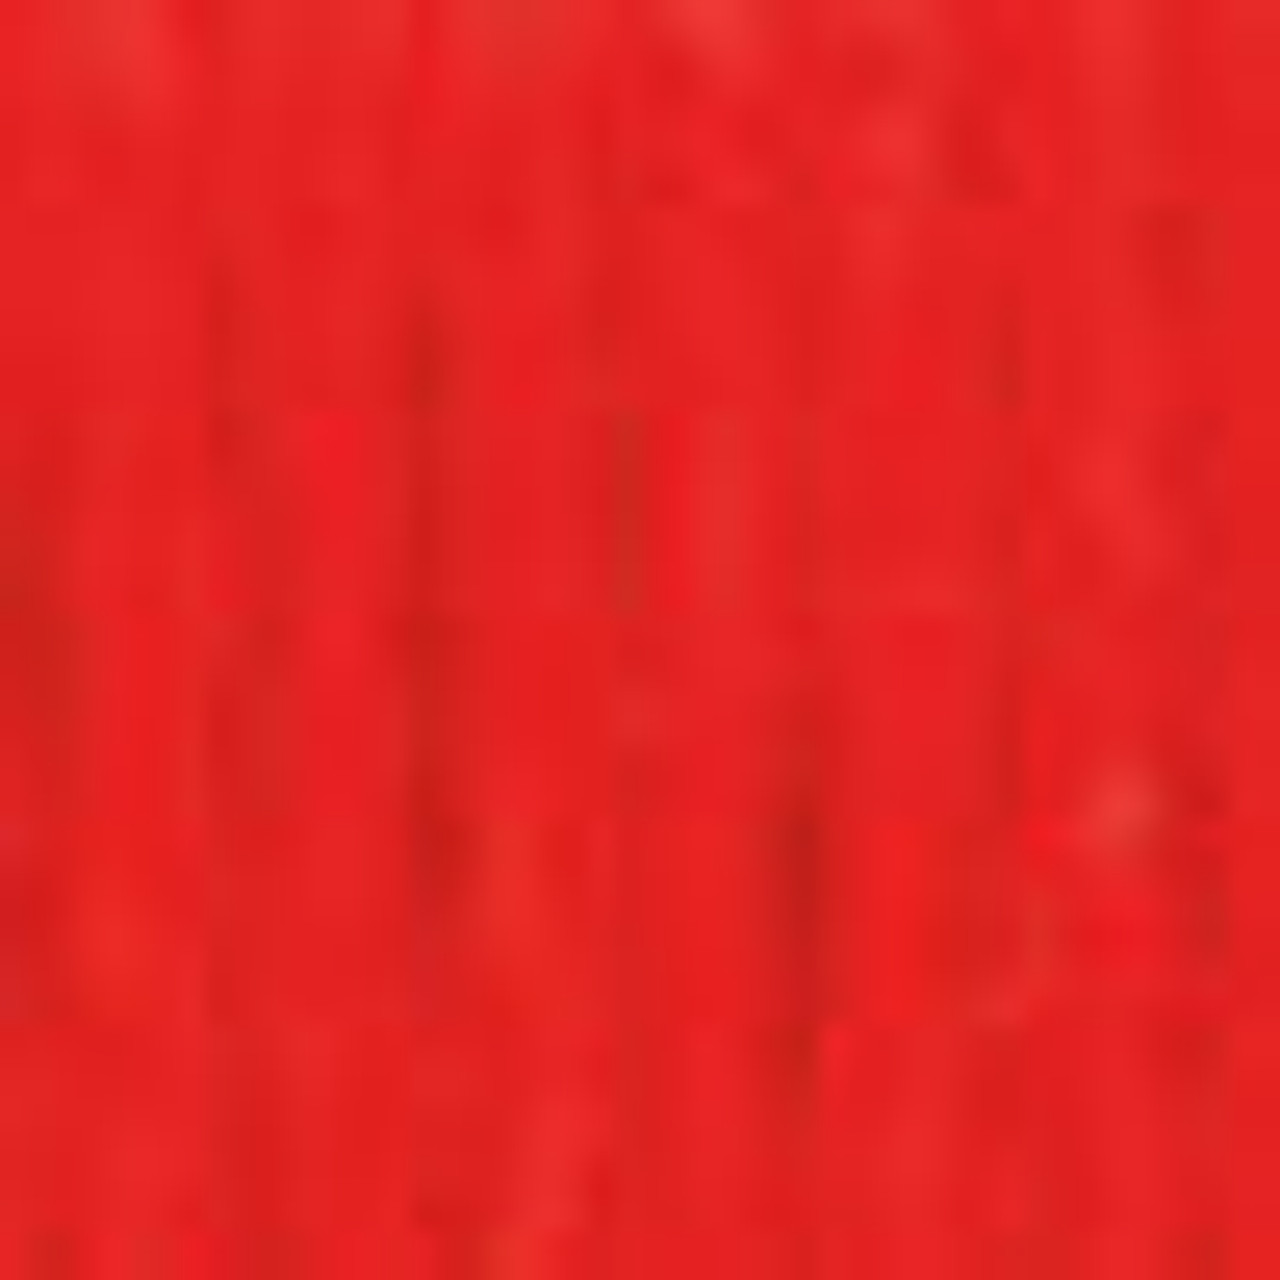 DMC # 321 Red Floss / Thread